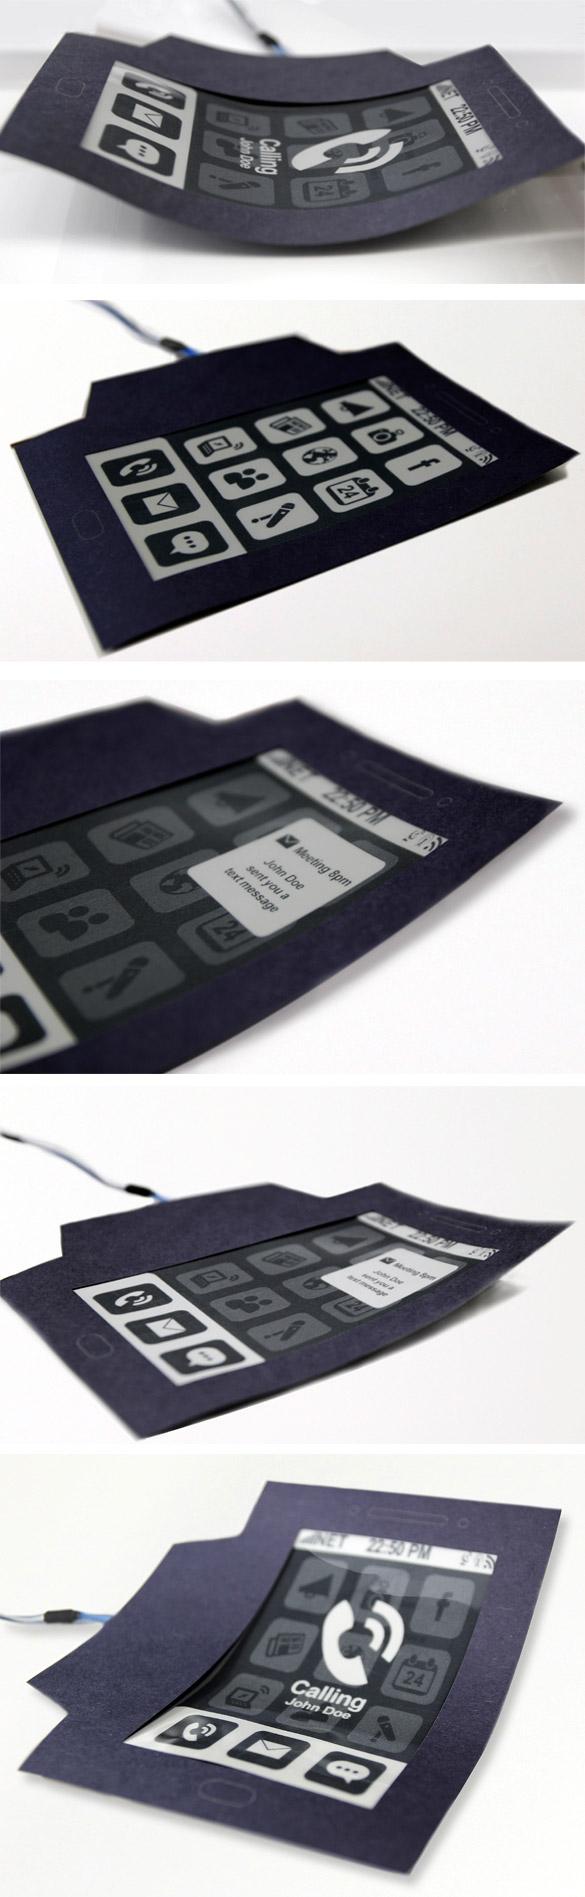 phonesmall